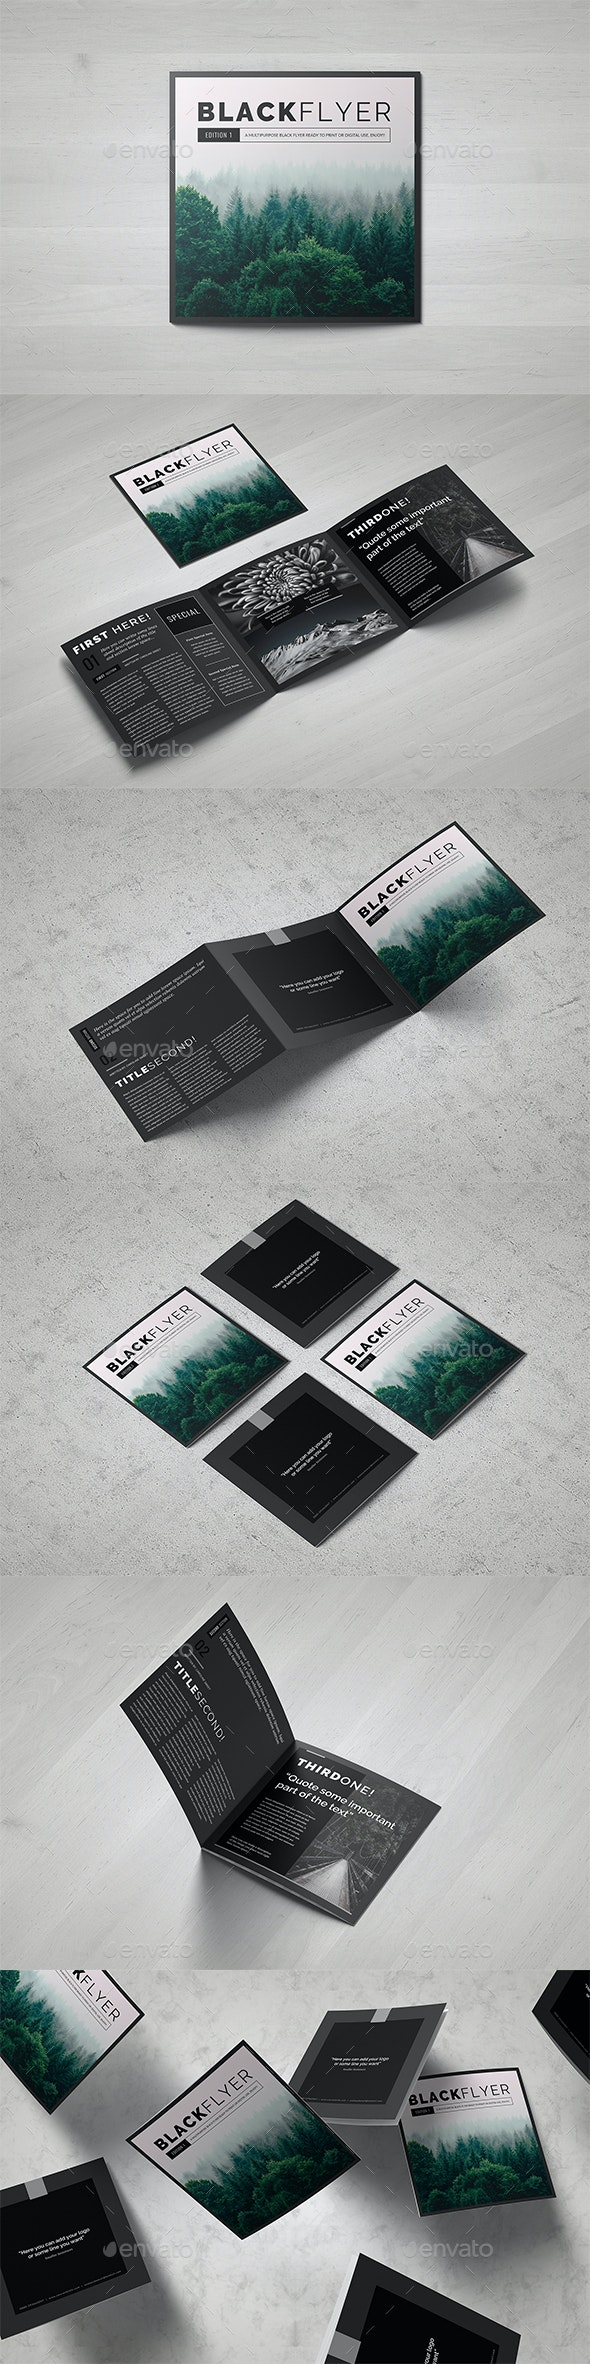 BlackFlyer Square Trifold - Brochures Print Templates